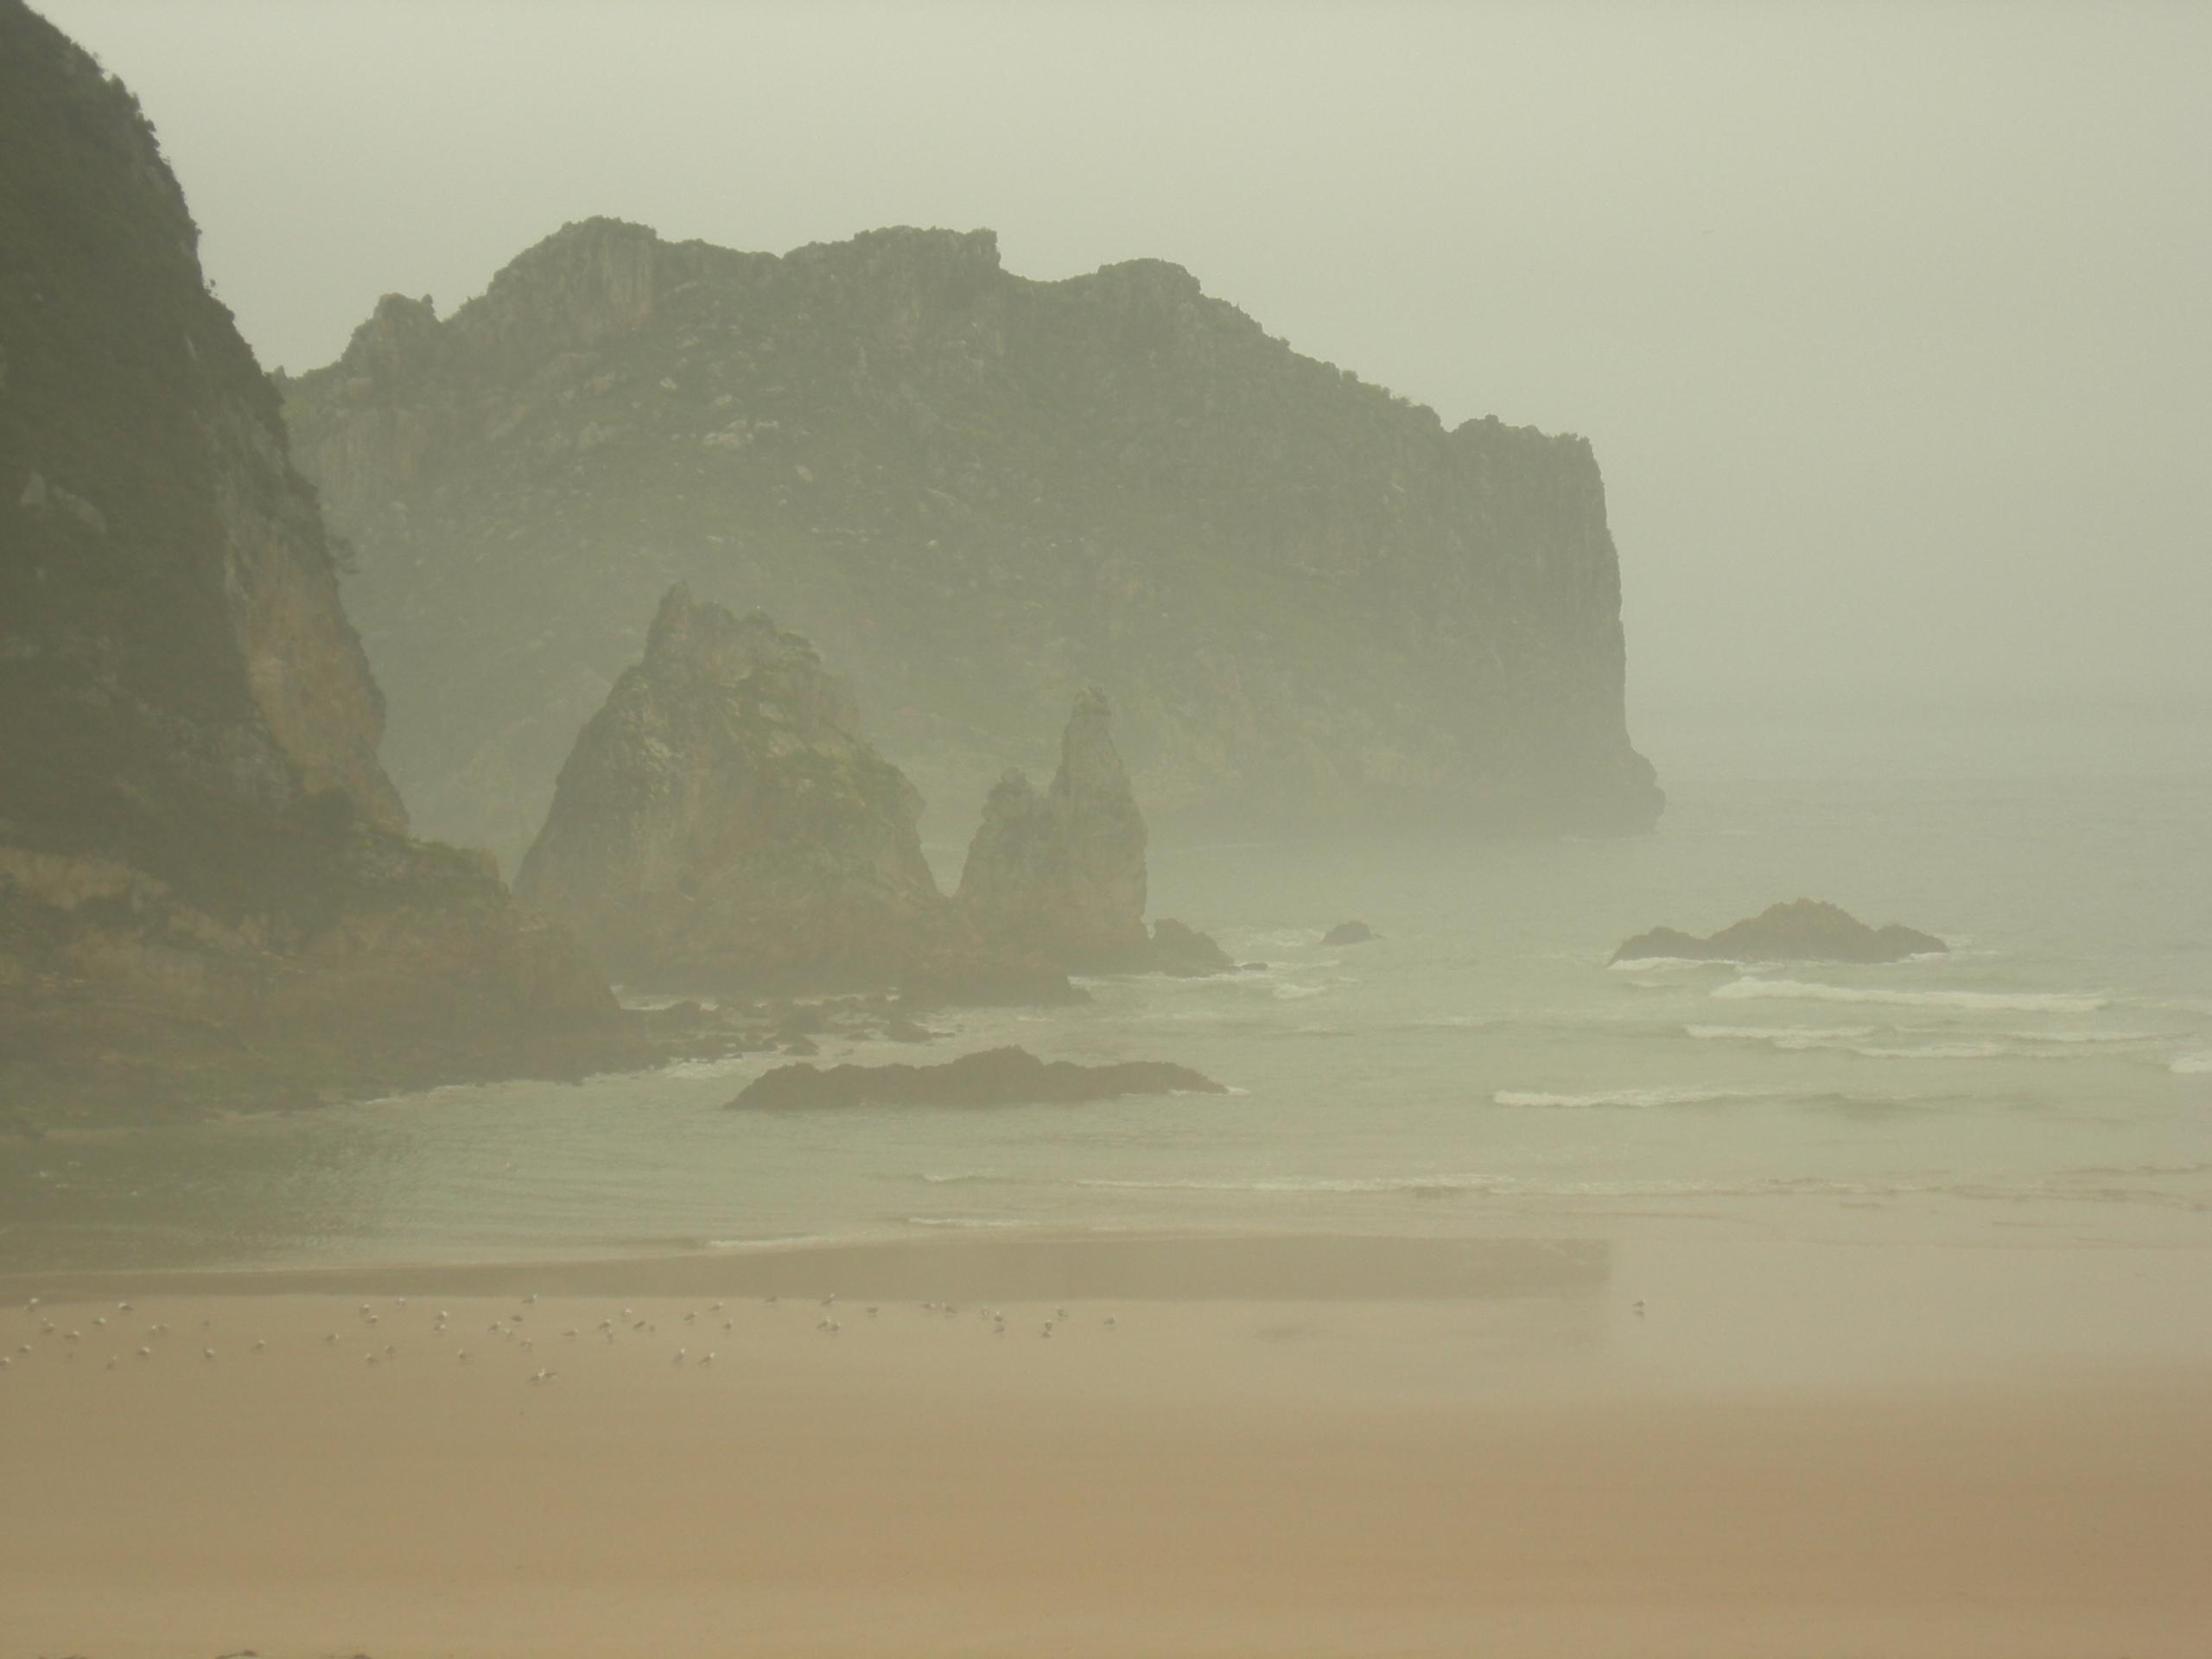 Zumaia,, Spain, beach, fog, photography - ivop | ello